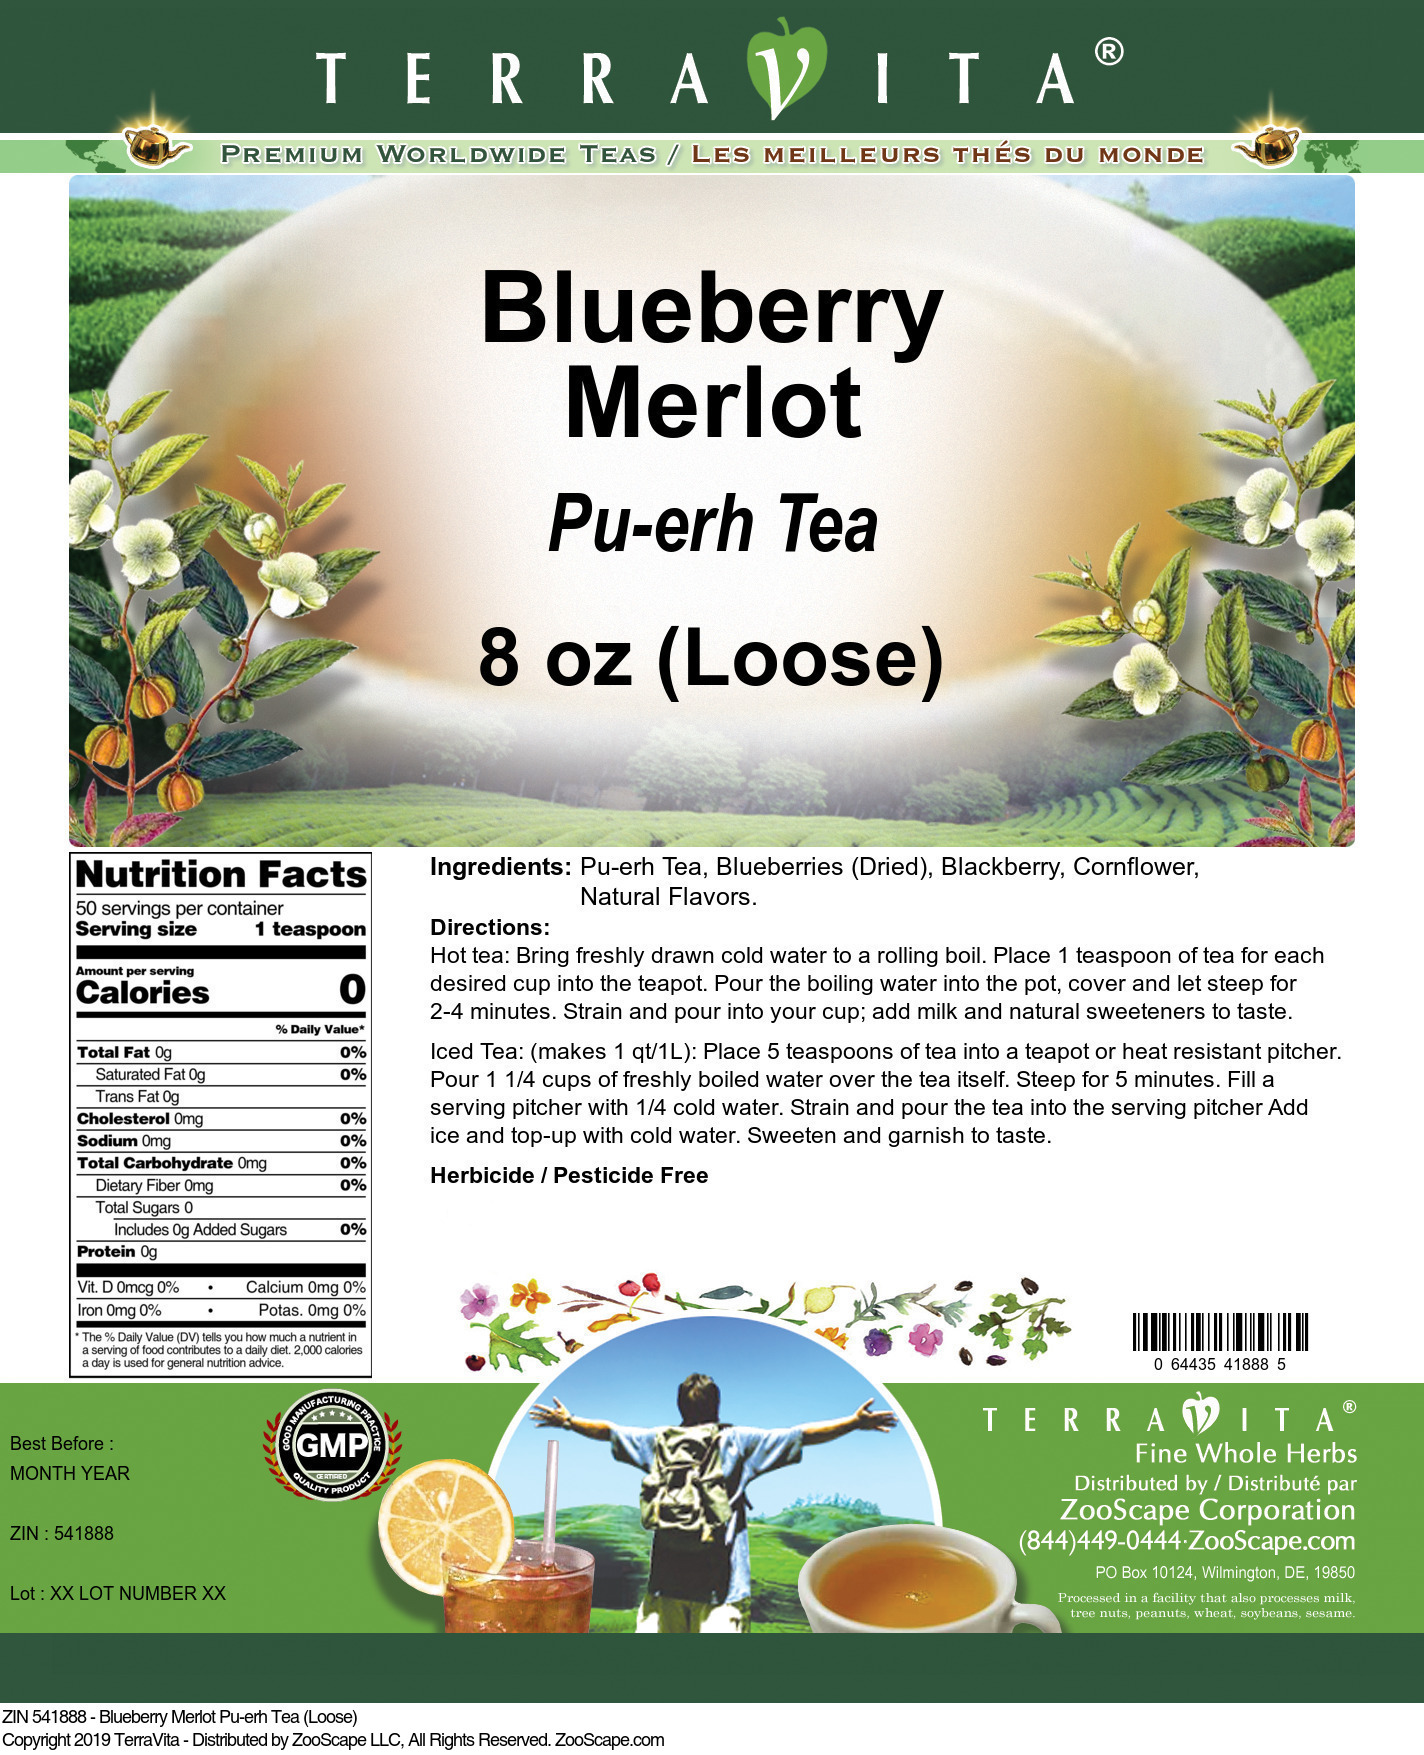 Blueberry Merlot Pu-erh Tea (Loose)